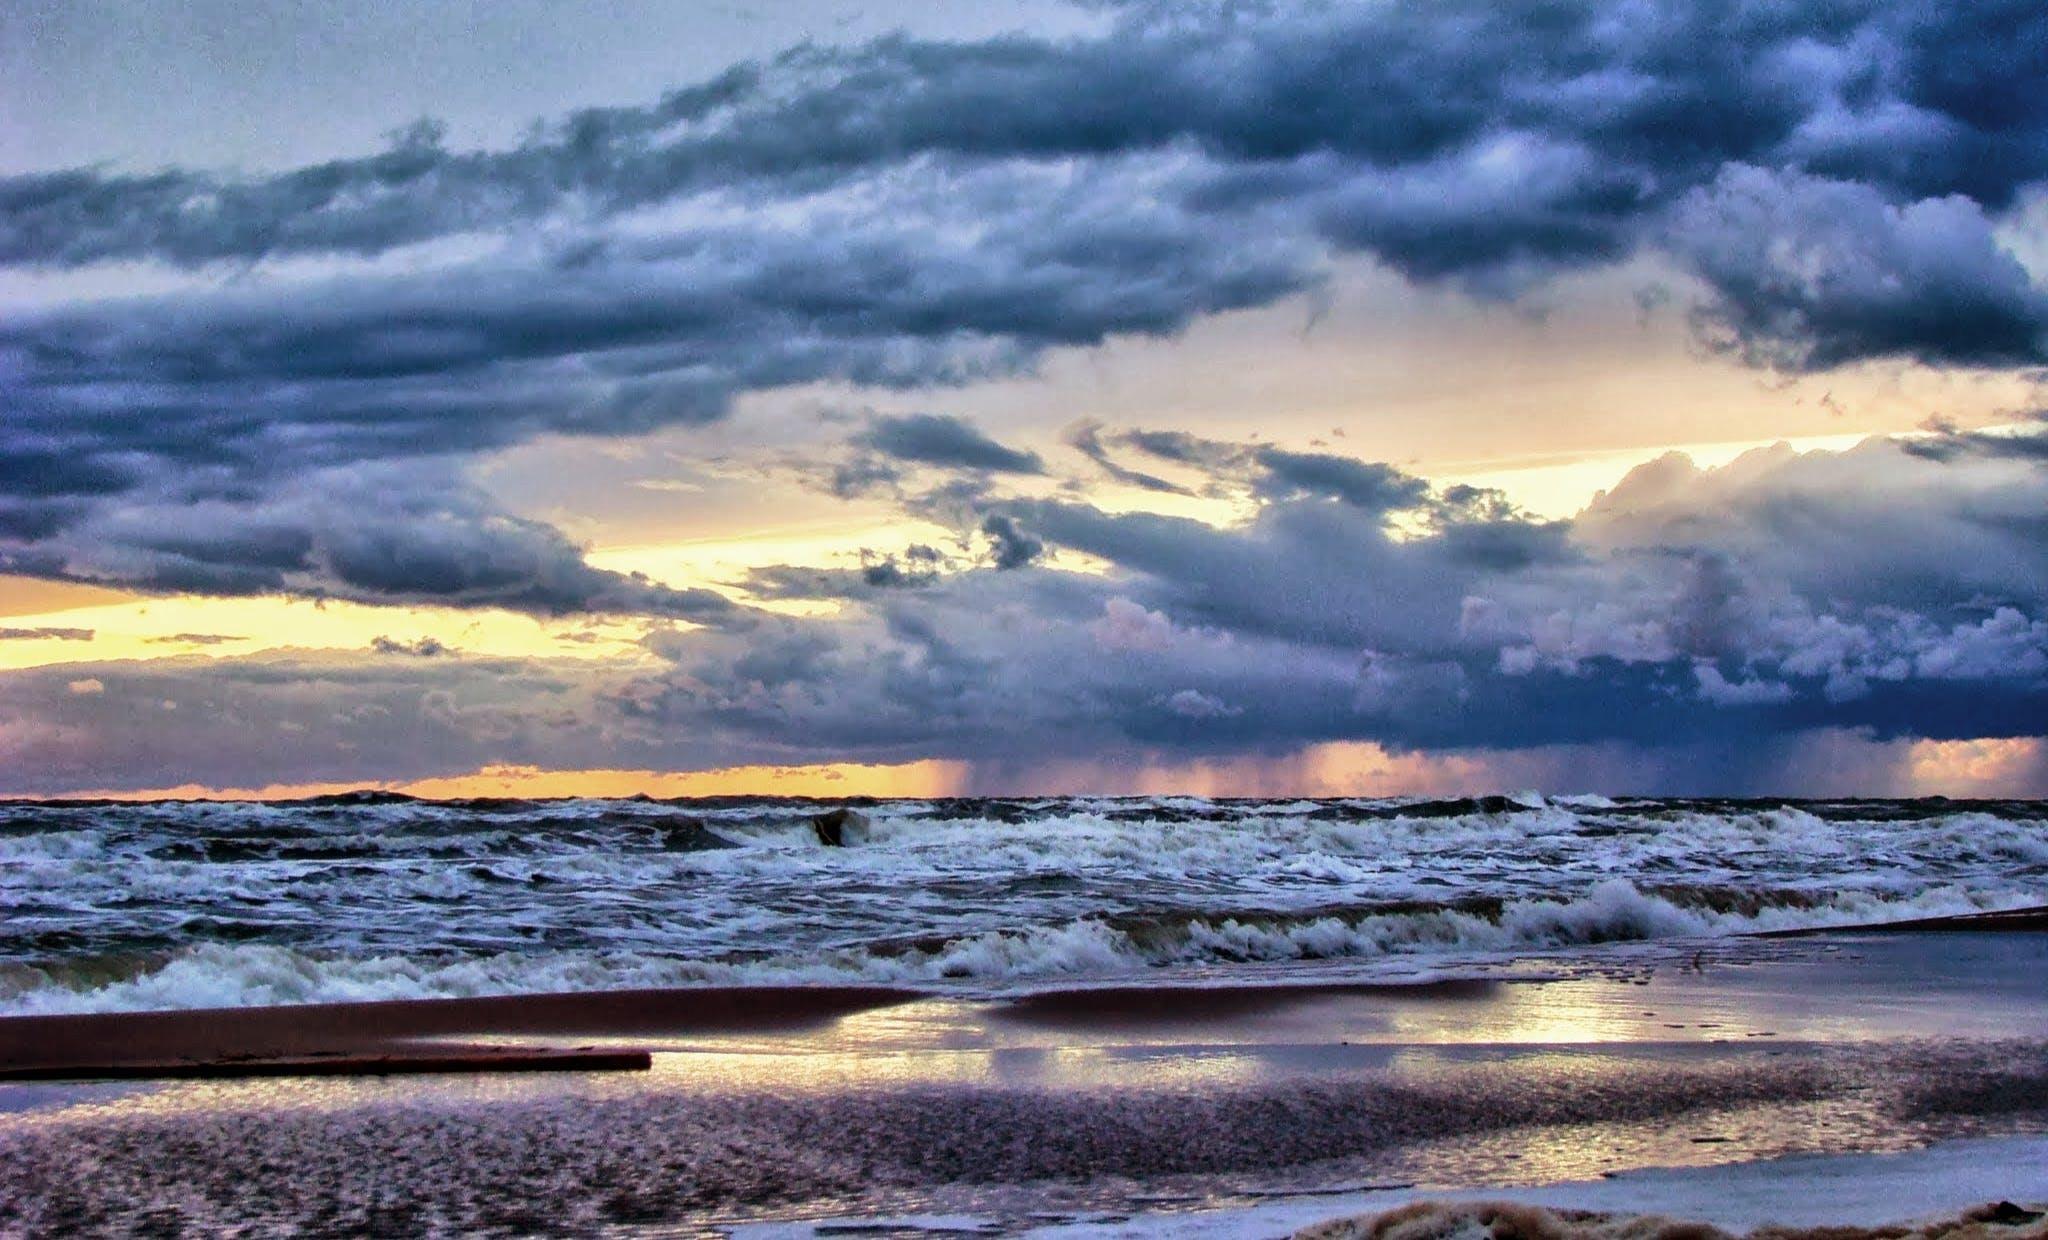 Free stock photo of sea, landscape, sky, sunset